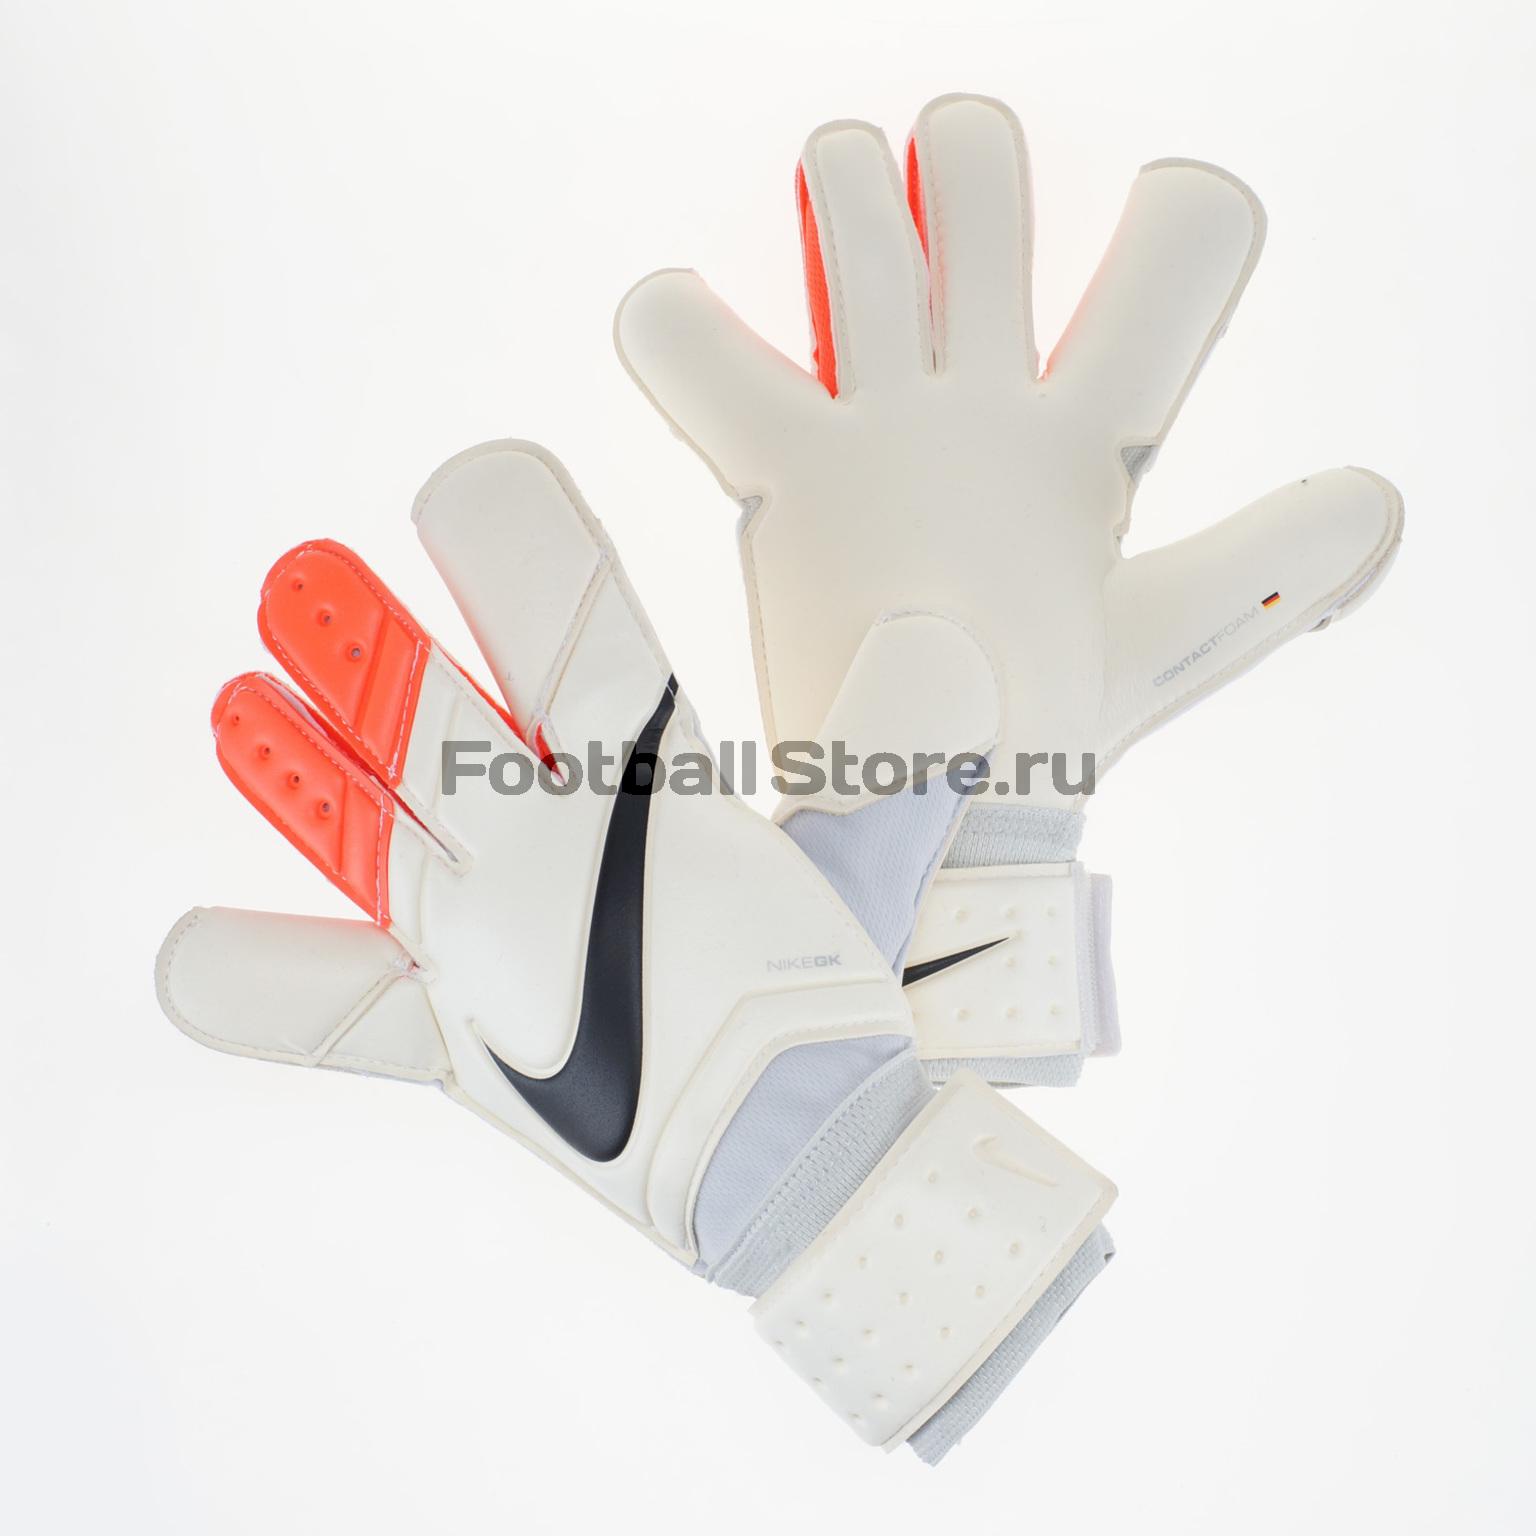 7a42e2b5 Перчатки вратарские Nike GK Vapor Grip 3 GS0275-183 - купить в ...